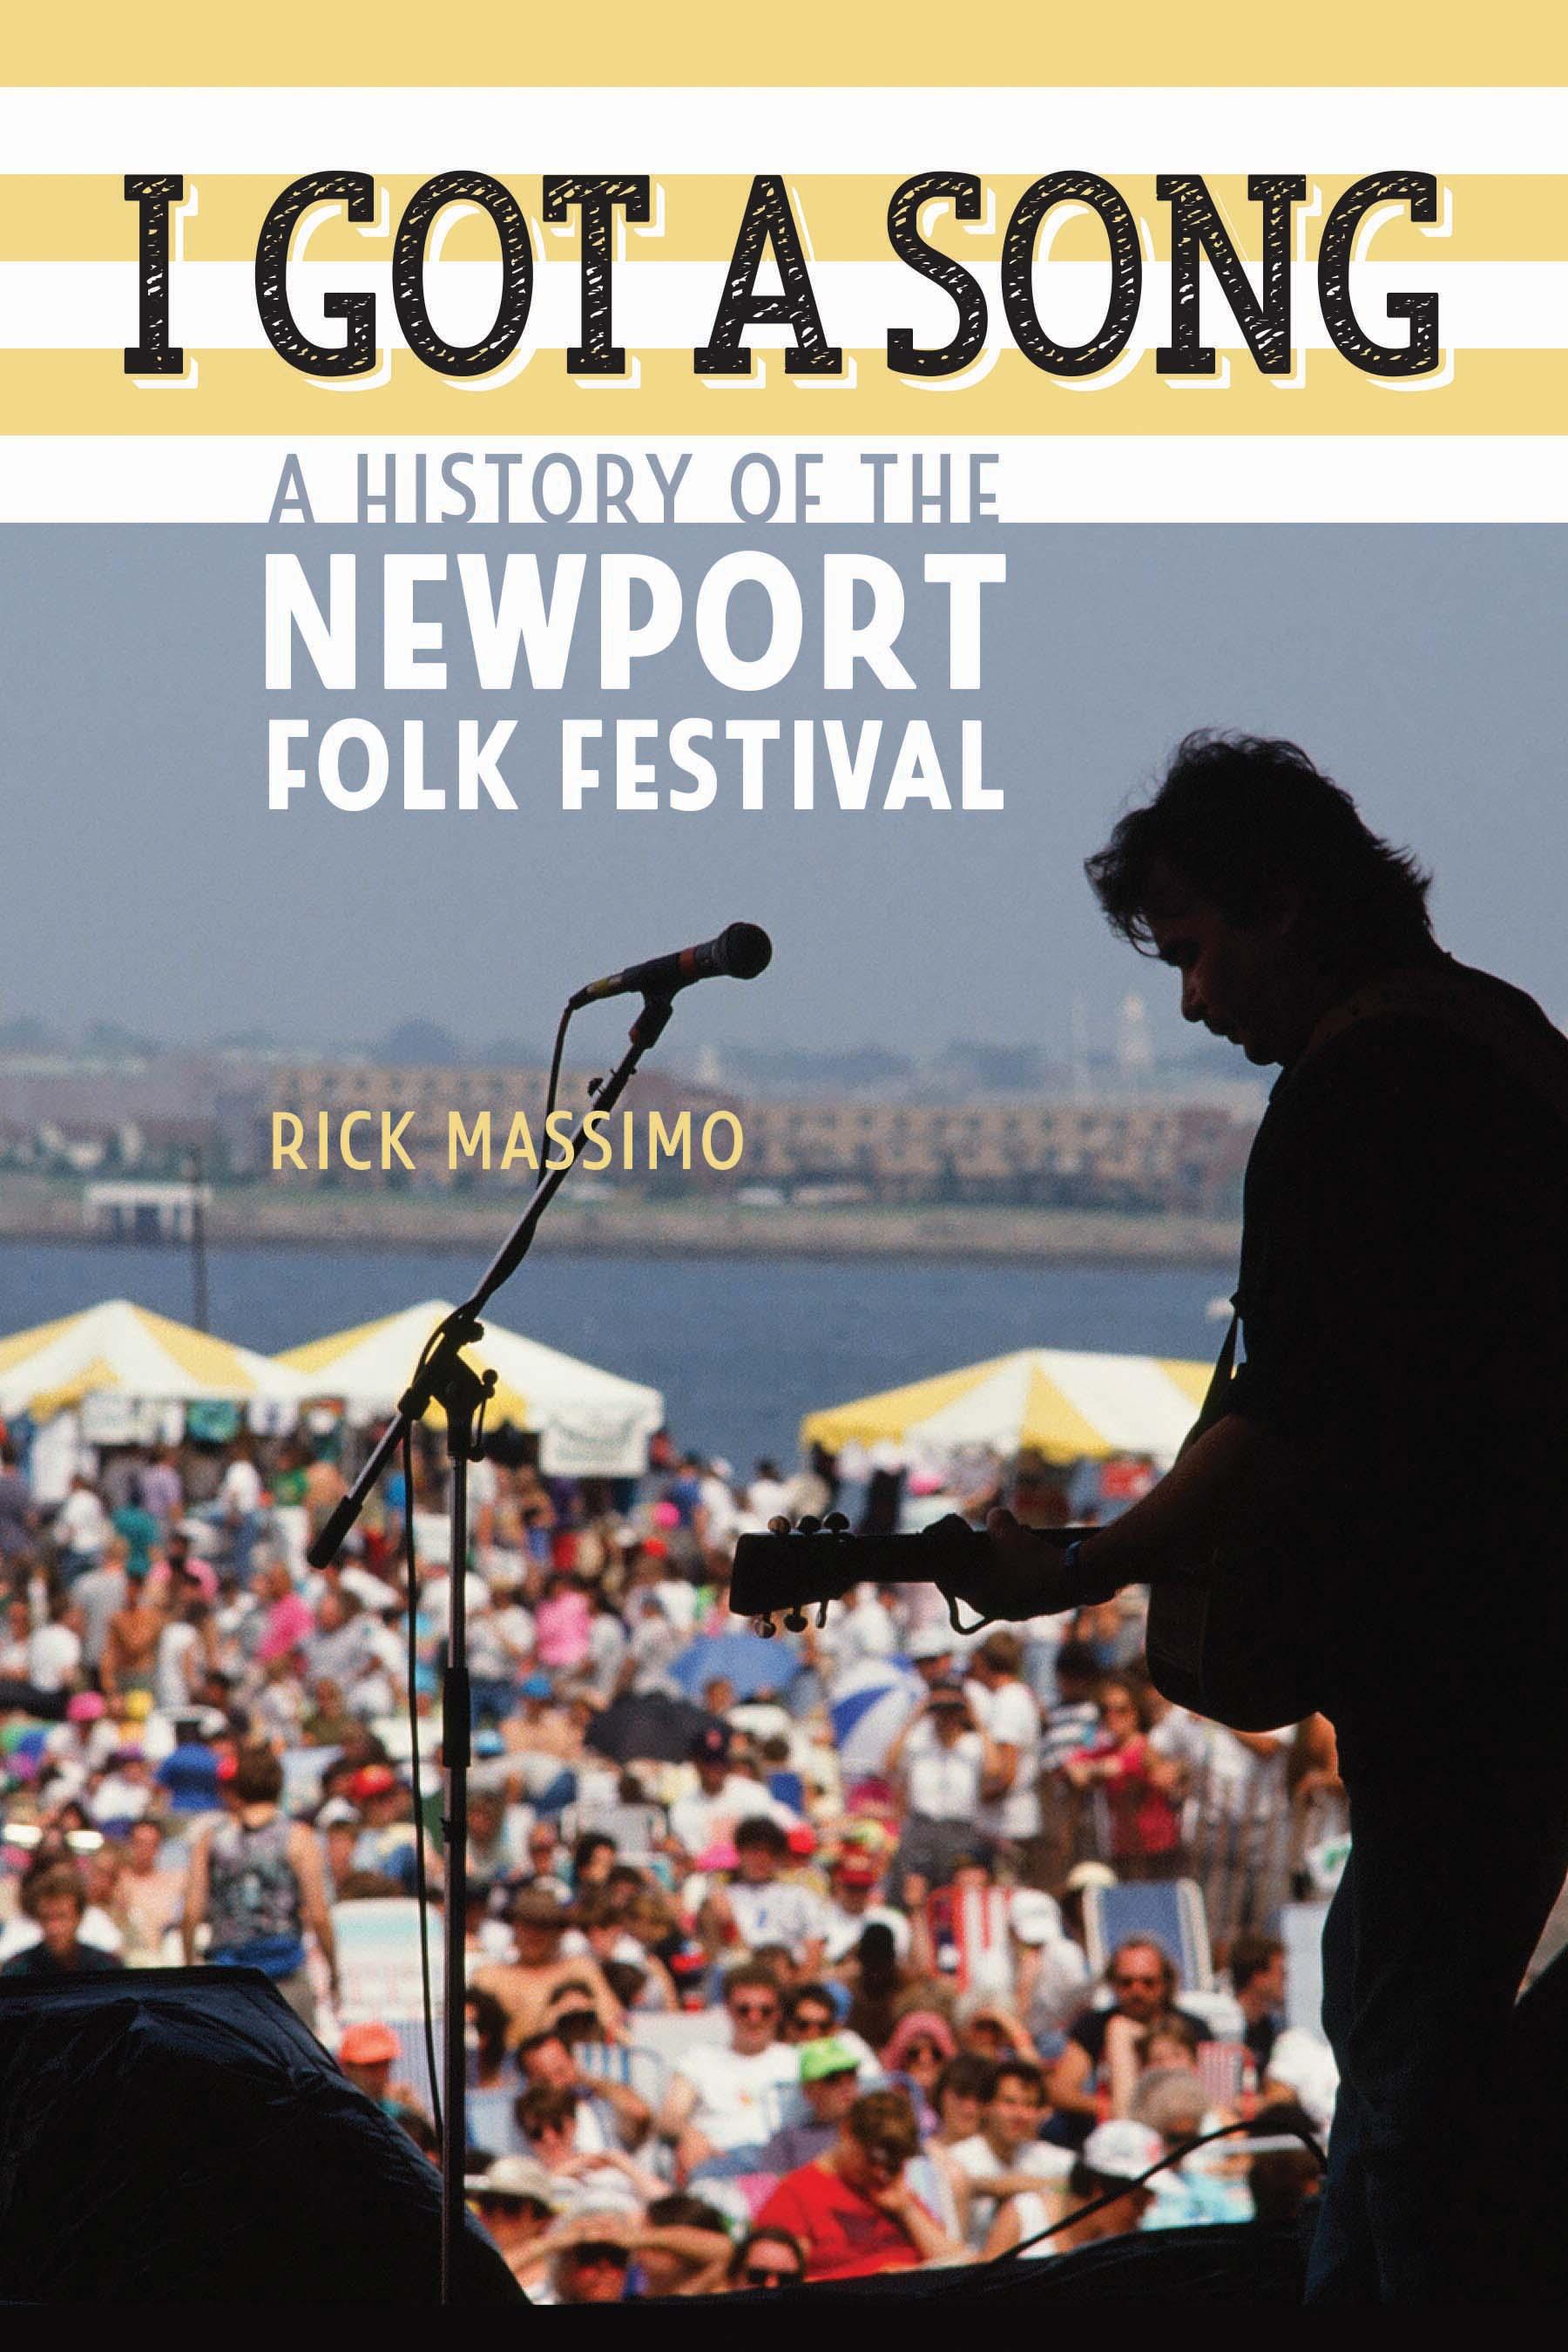 Meet the Author: Rick Massimo